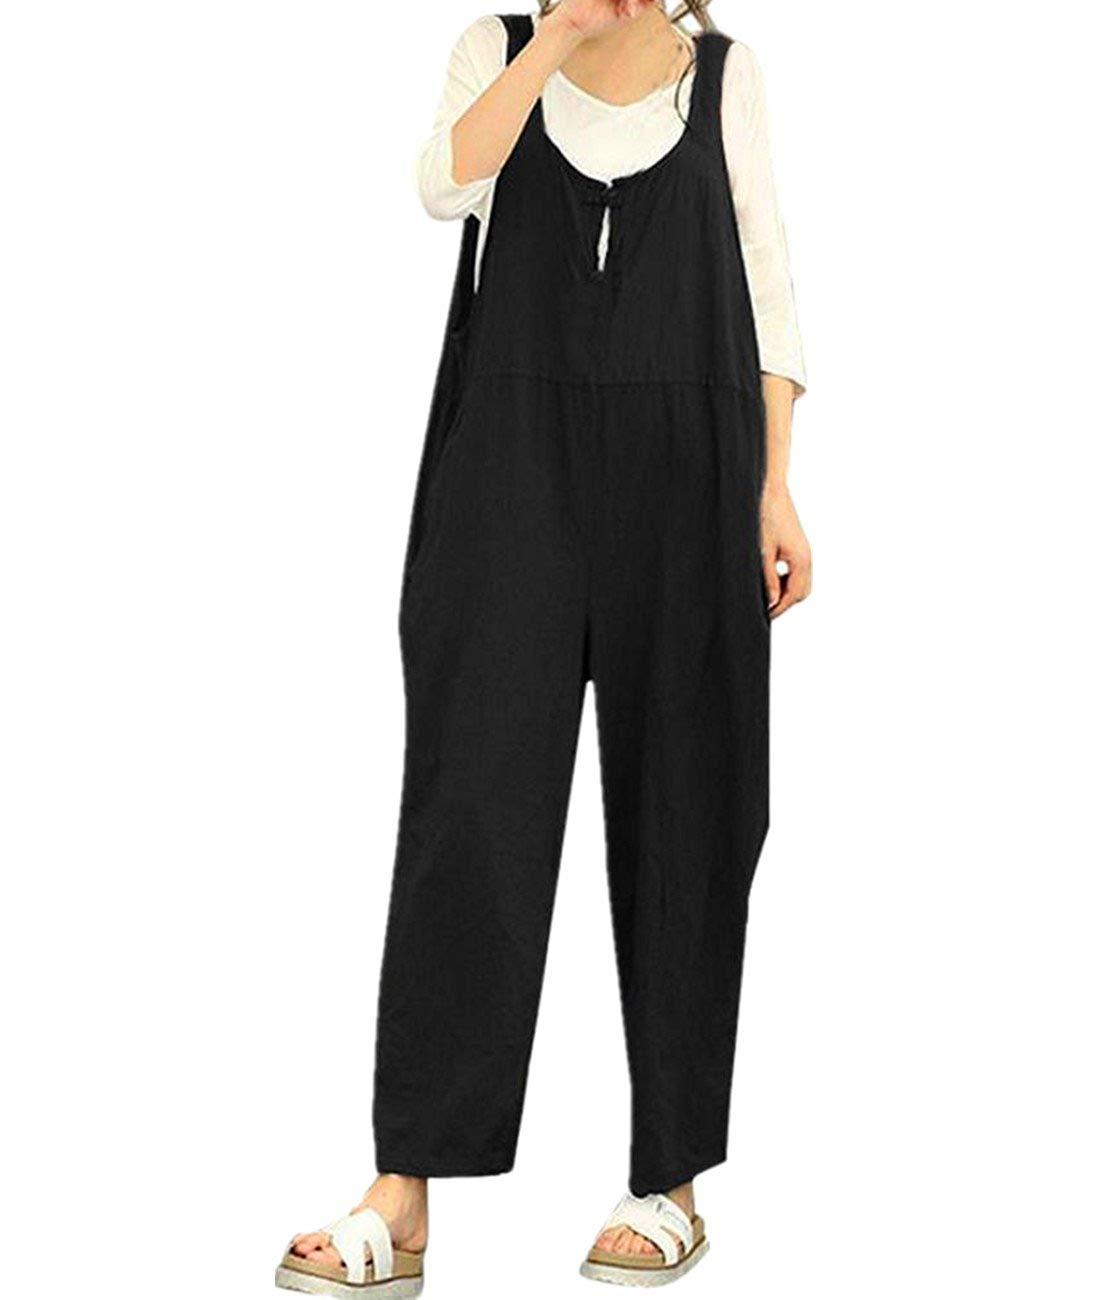 9d7cea04685 Get Quotations · Qisc Women Pants Womens Casual Sleeveless Dungarees Loose  Cotton Linen Bib Baggy Overalls Jumpsuit Pants Plus